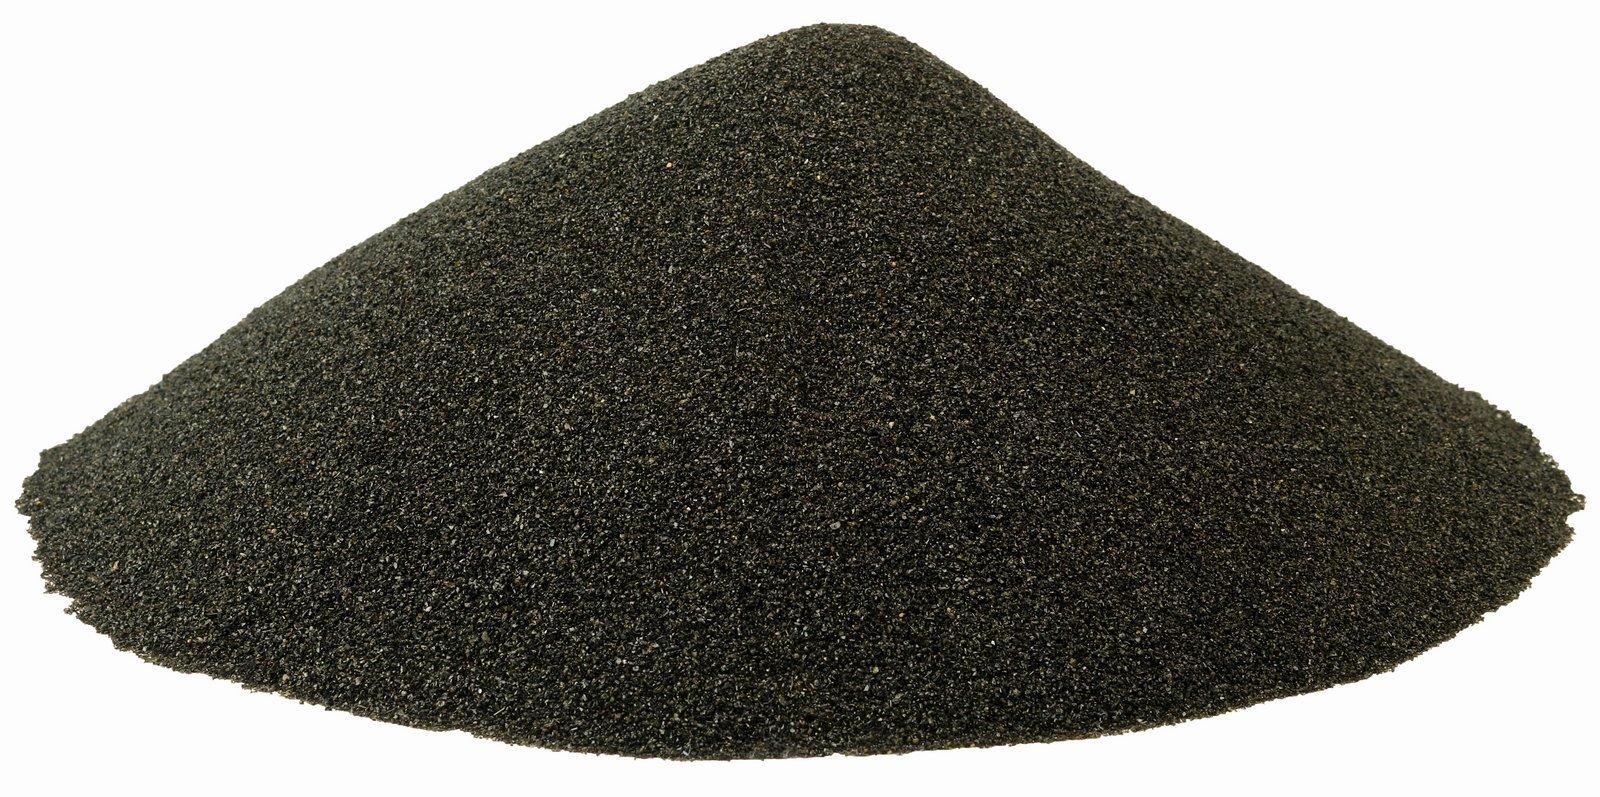 BLACK BEAUTY Abrasive Blast Media Fine Abrasive 20/40 Mesh Size for use in Sandblast Cabinet - 25 LBS by BLACK BEAUTY